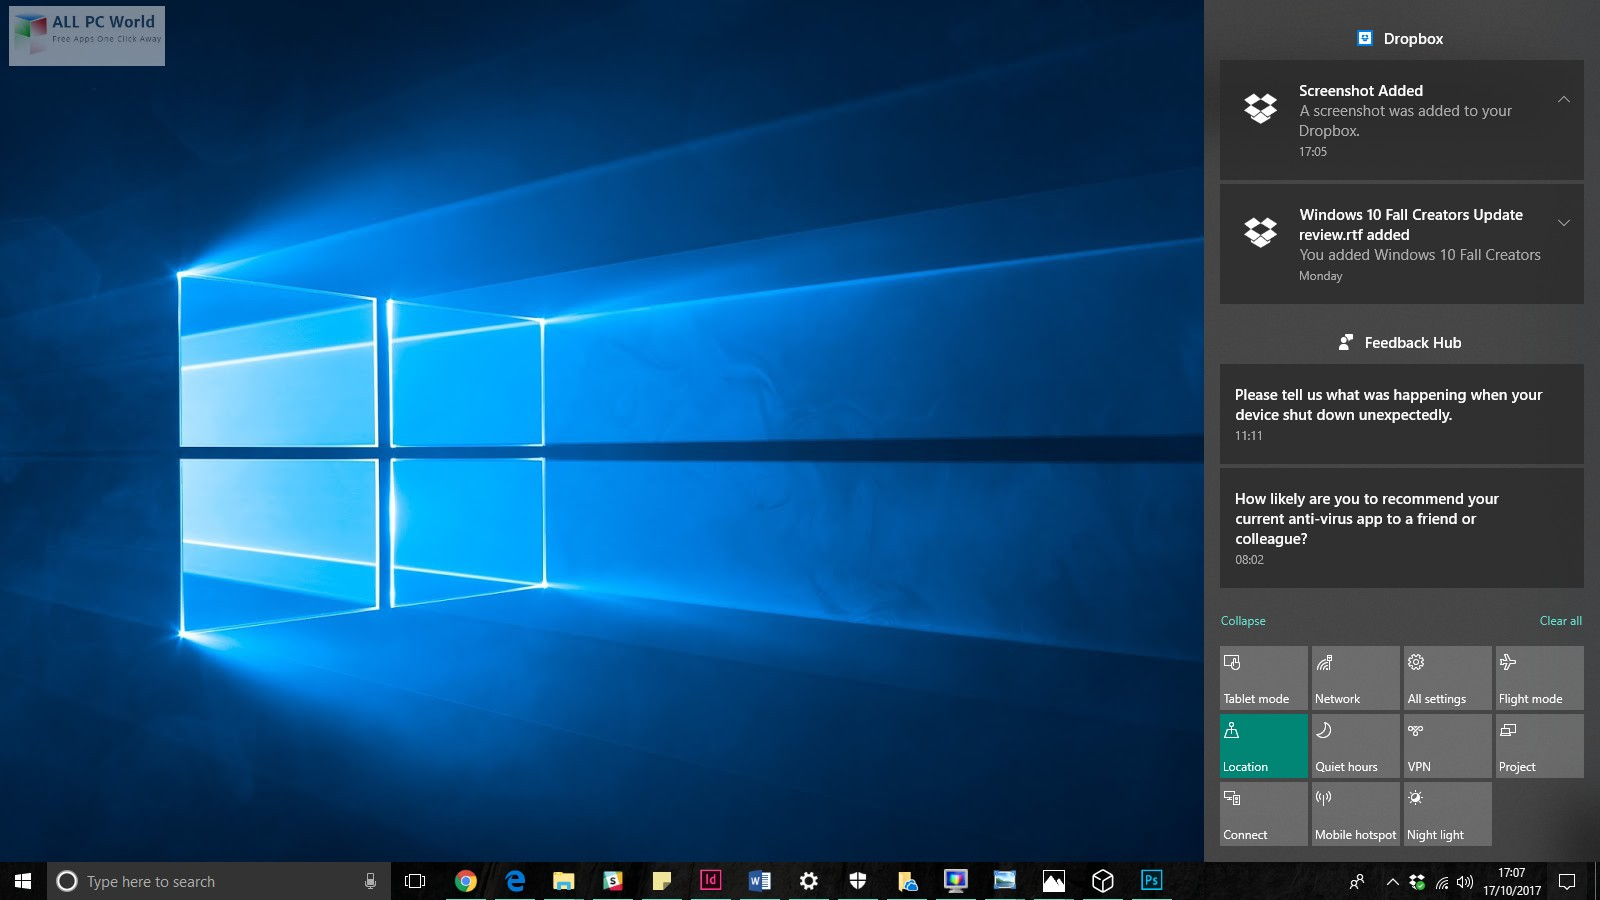 Windows 10 Pro incl Office 2019 Nov 2019 Download